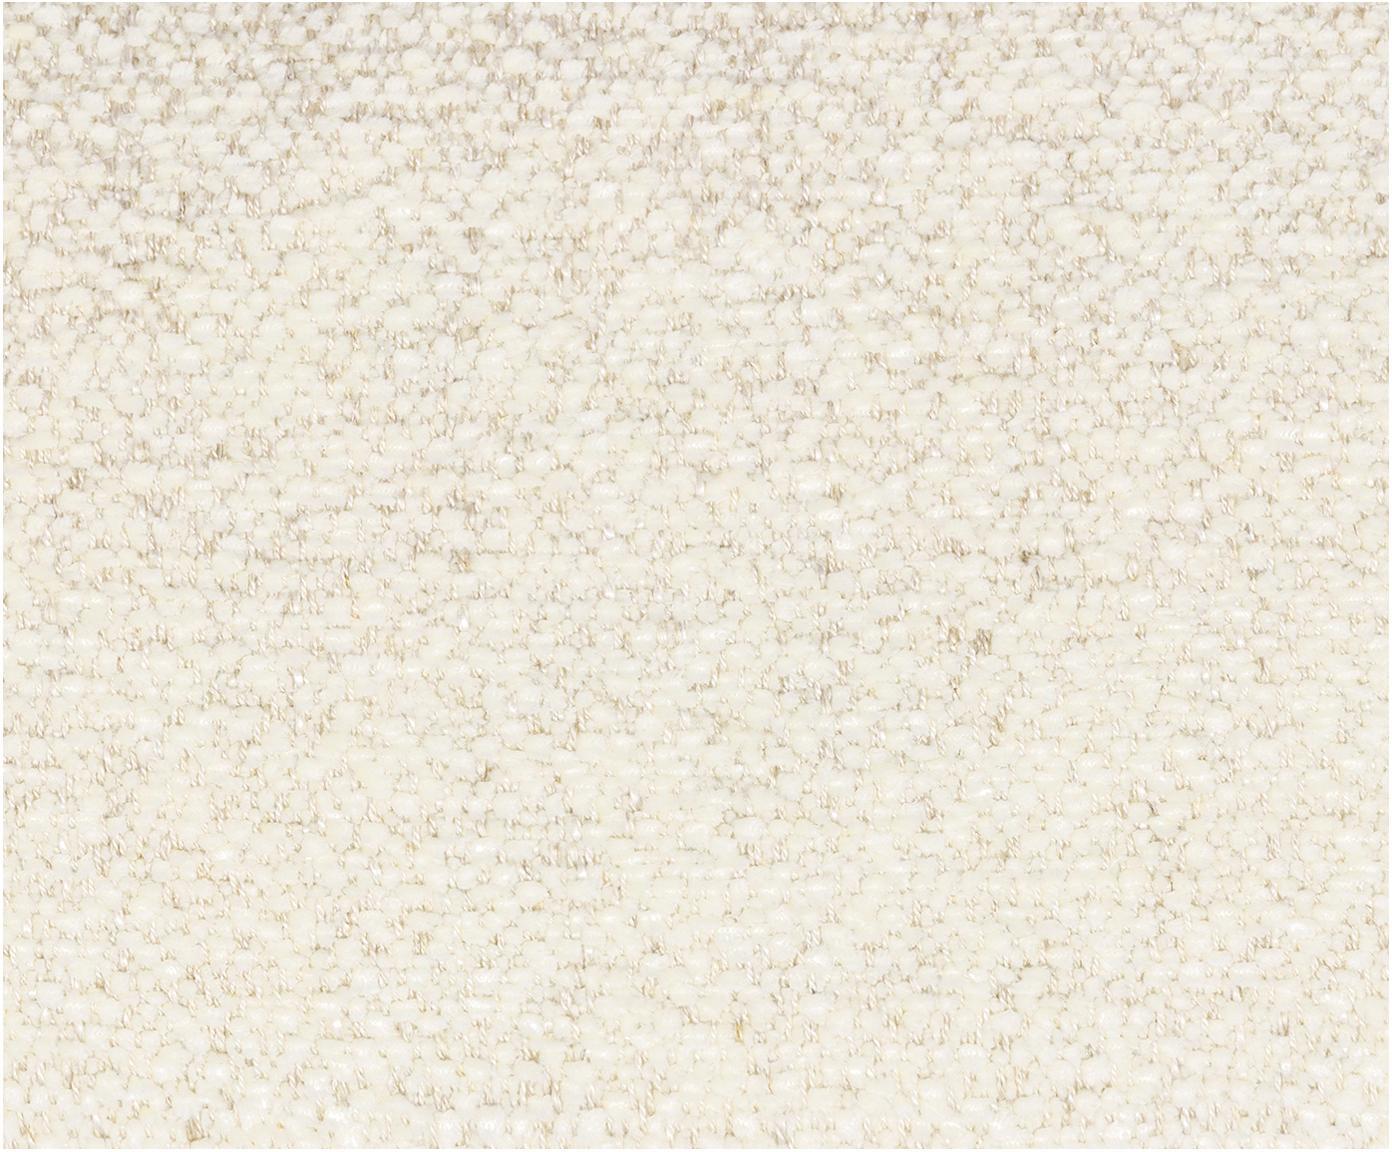 Housse de coussin en tissu beige bouclé Noa, Beige